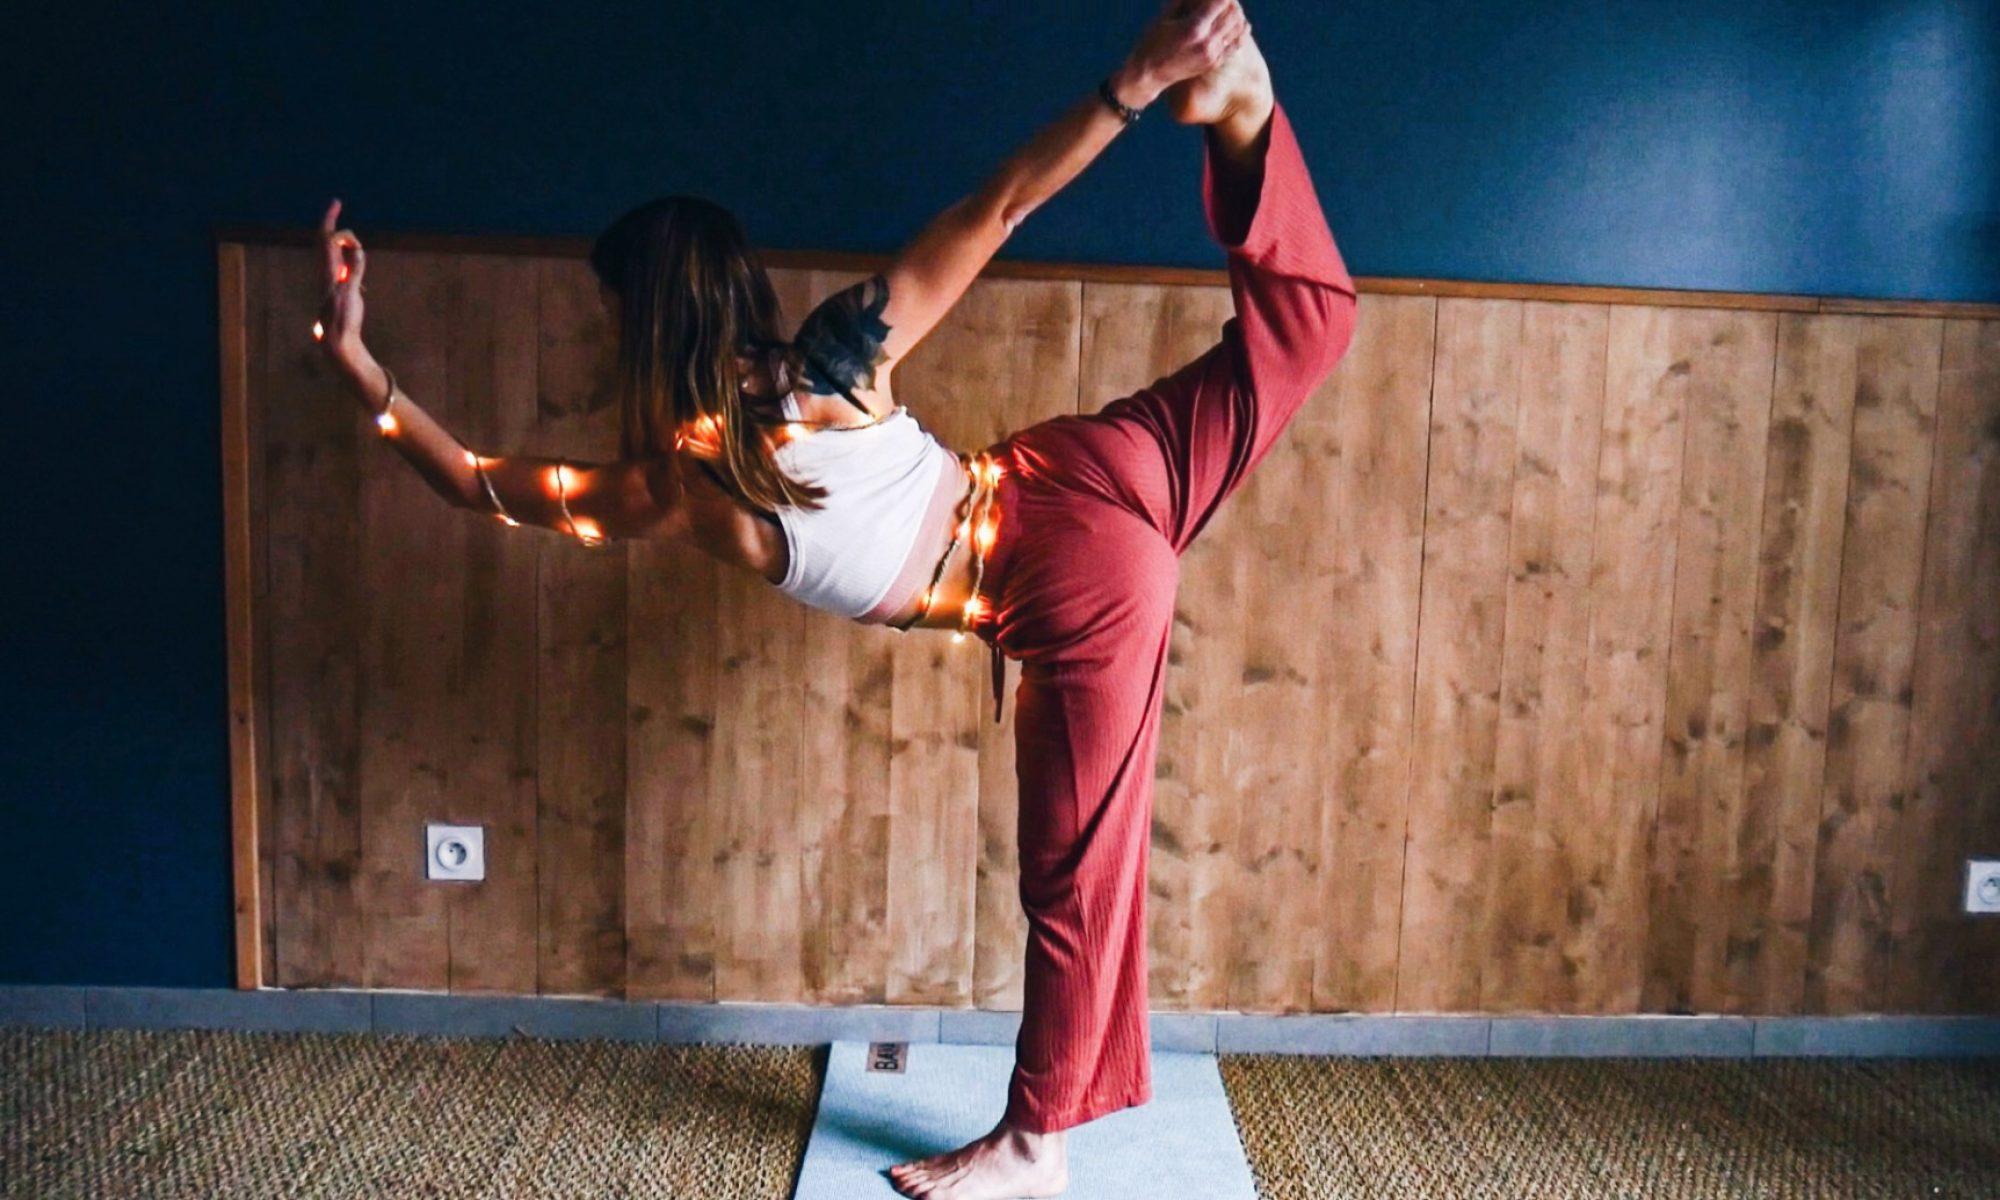 Yoga . Sport, aventures et partage 😃